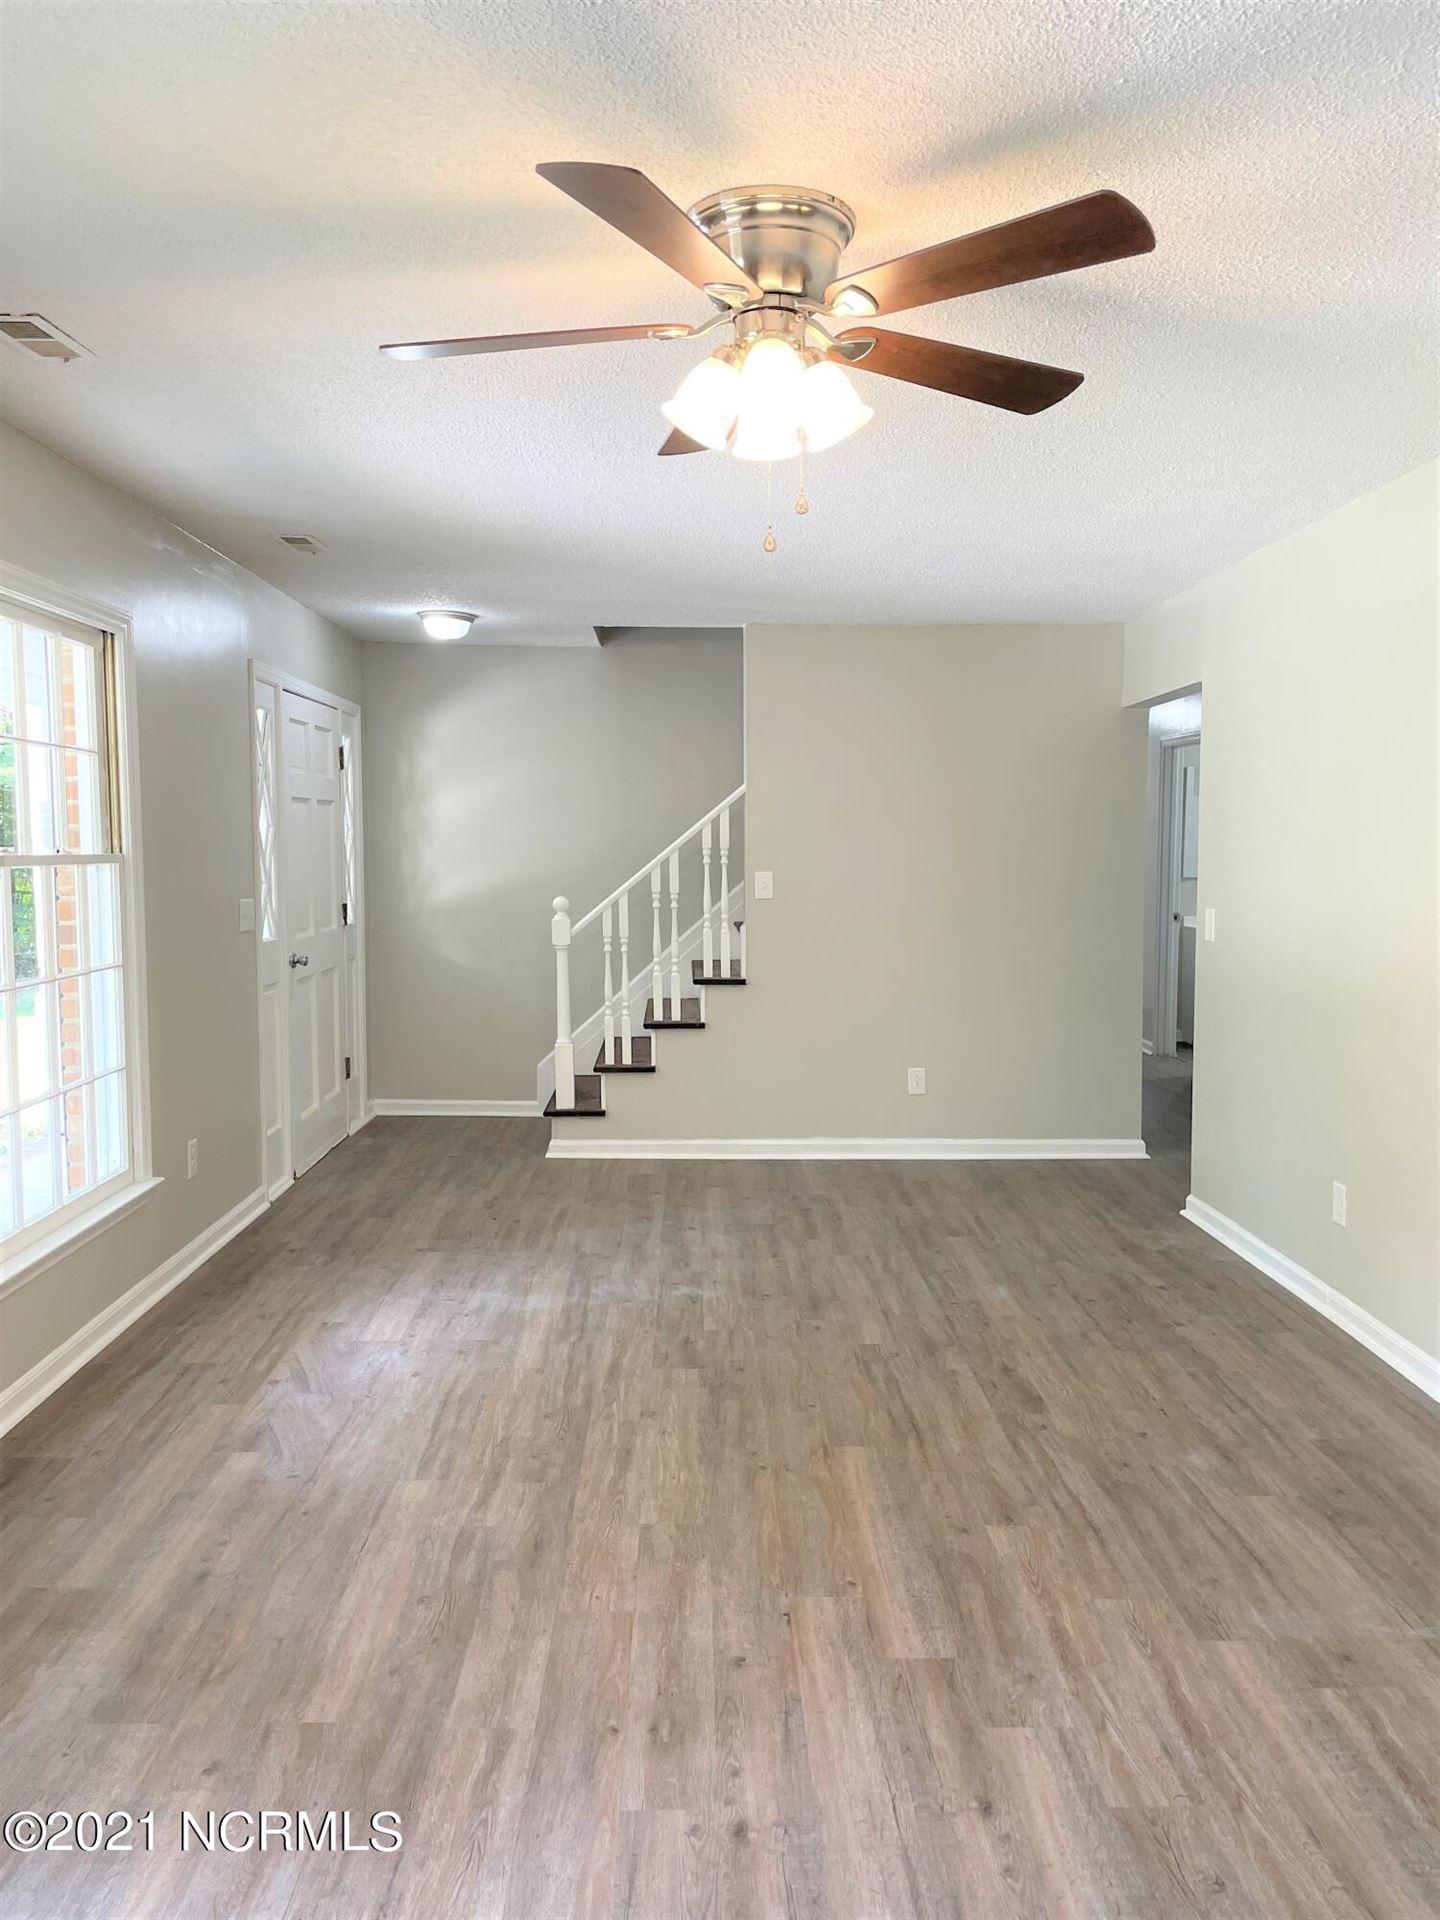 Photo of 1285 Old Maplehurst Road, Jacksonville, NC 28540 (MLS # 100293164)